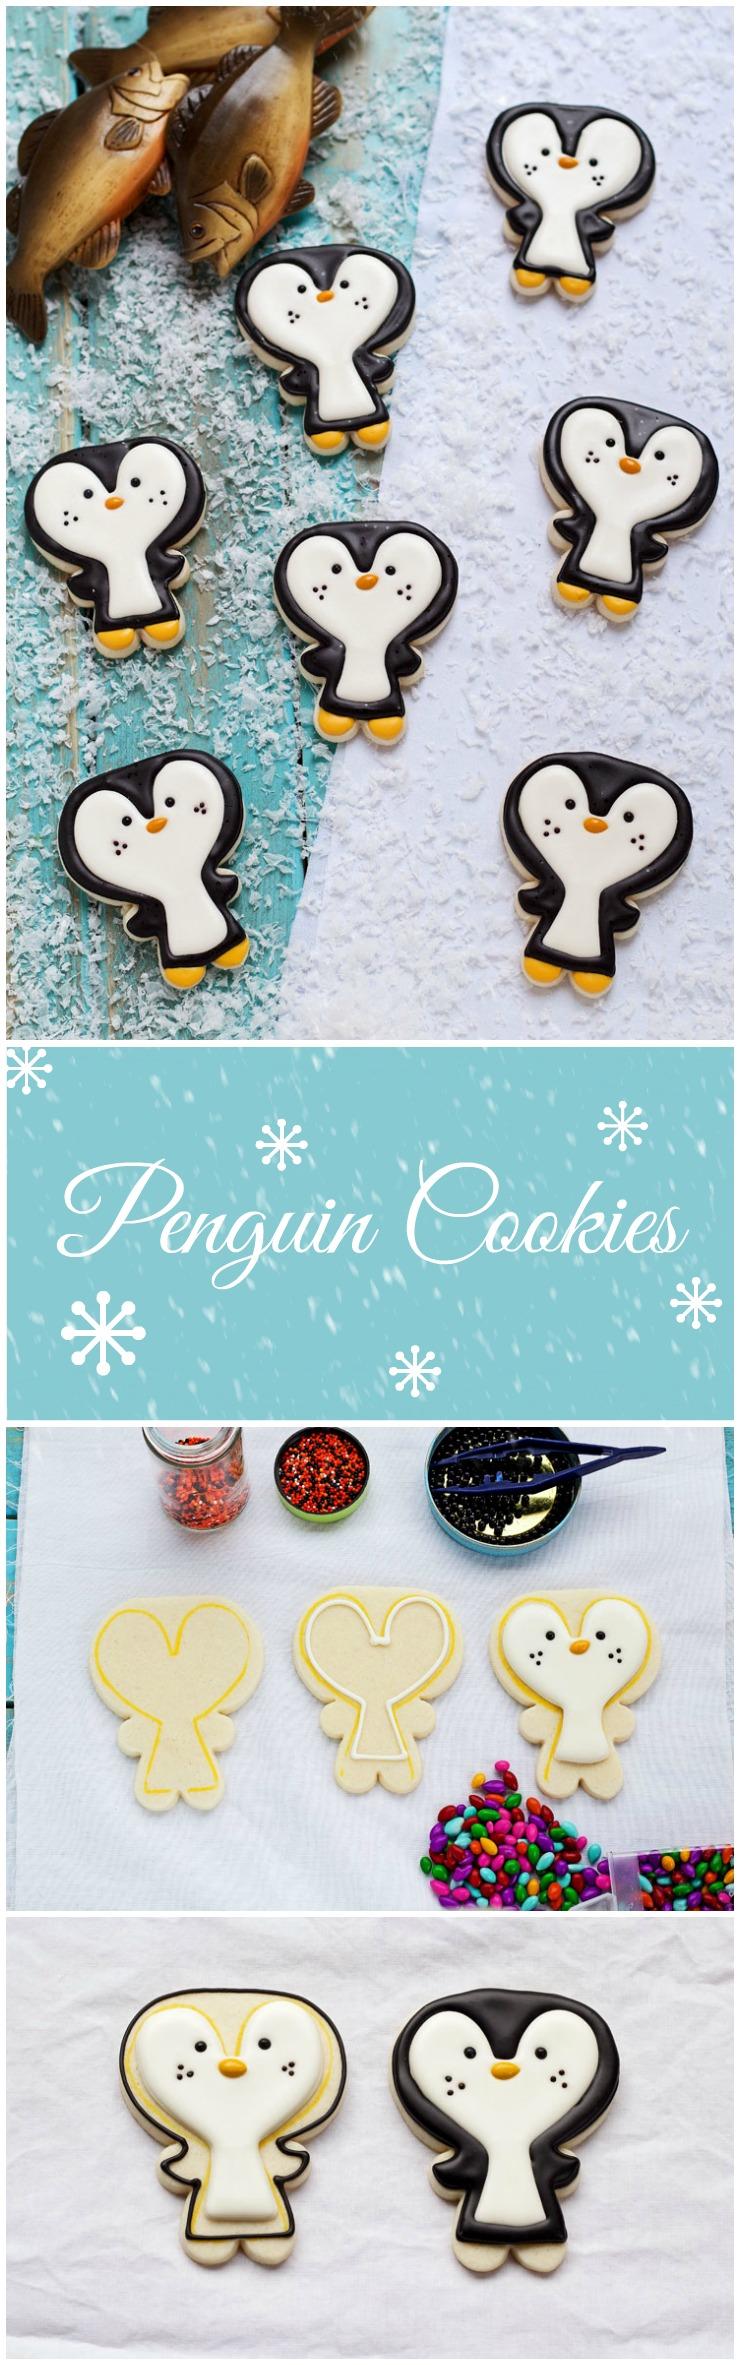 Easy Penguin Cookies   The Bearfoot Baker